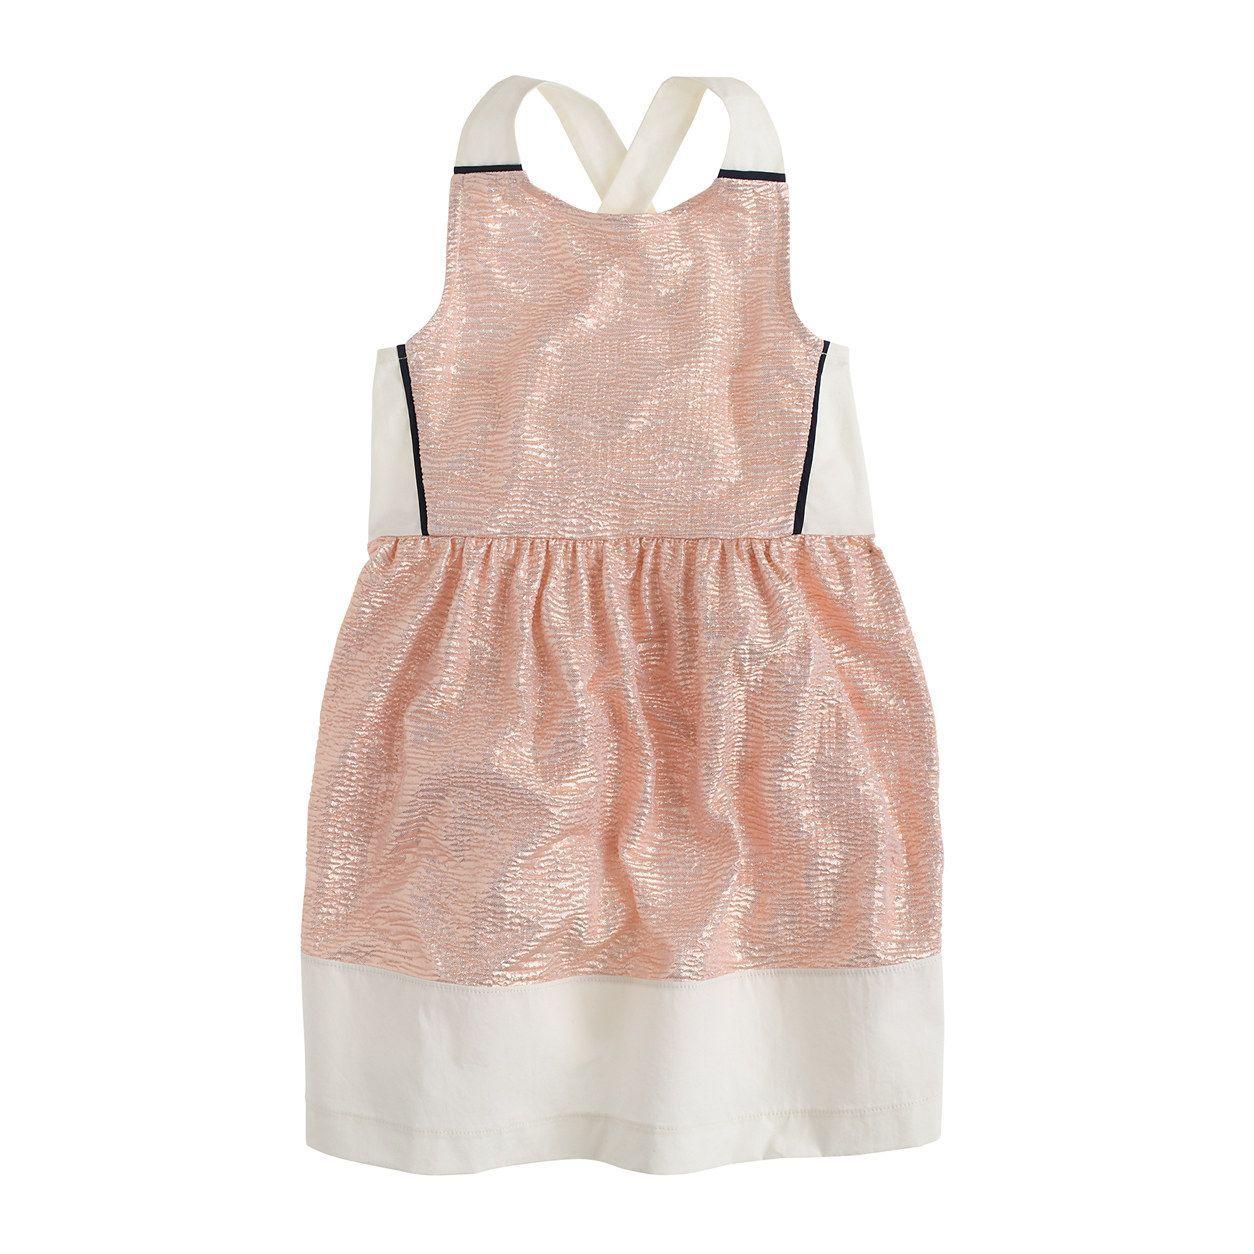 d9582da5c6c crewcuts Girls Metallic Cross-Back Dress (Size 16 Kid)